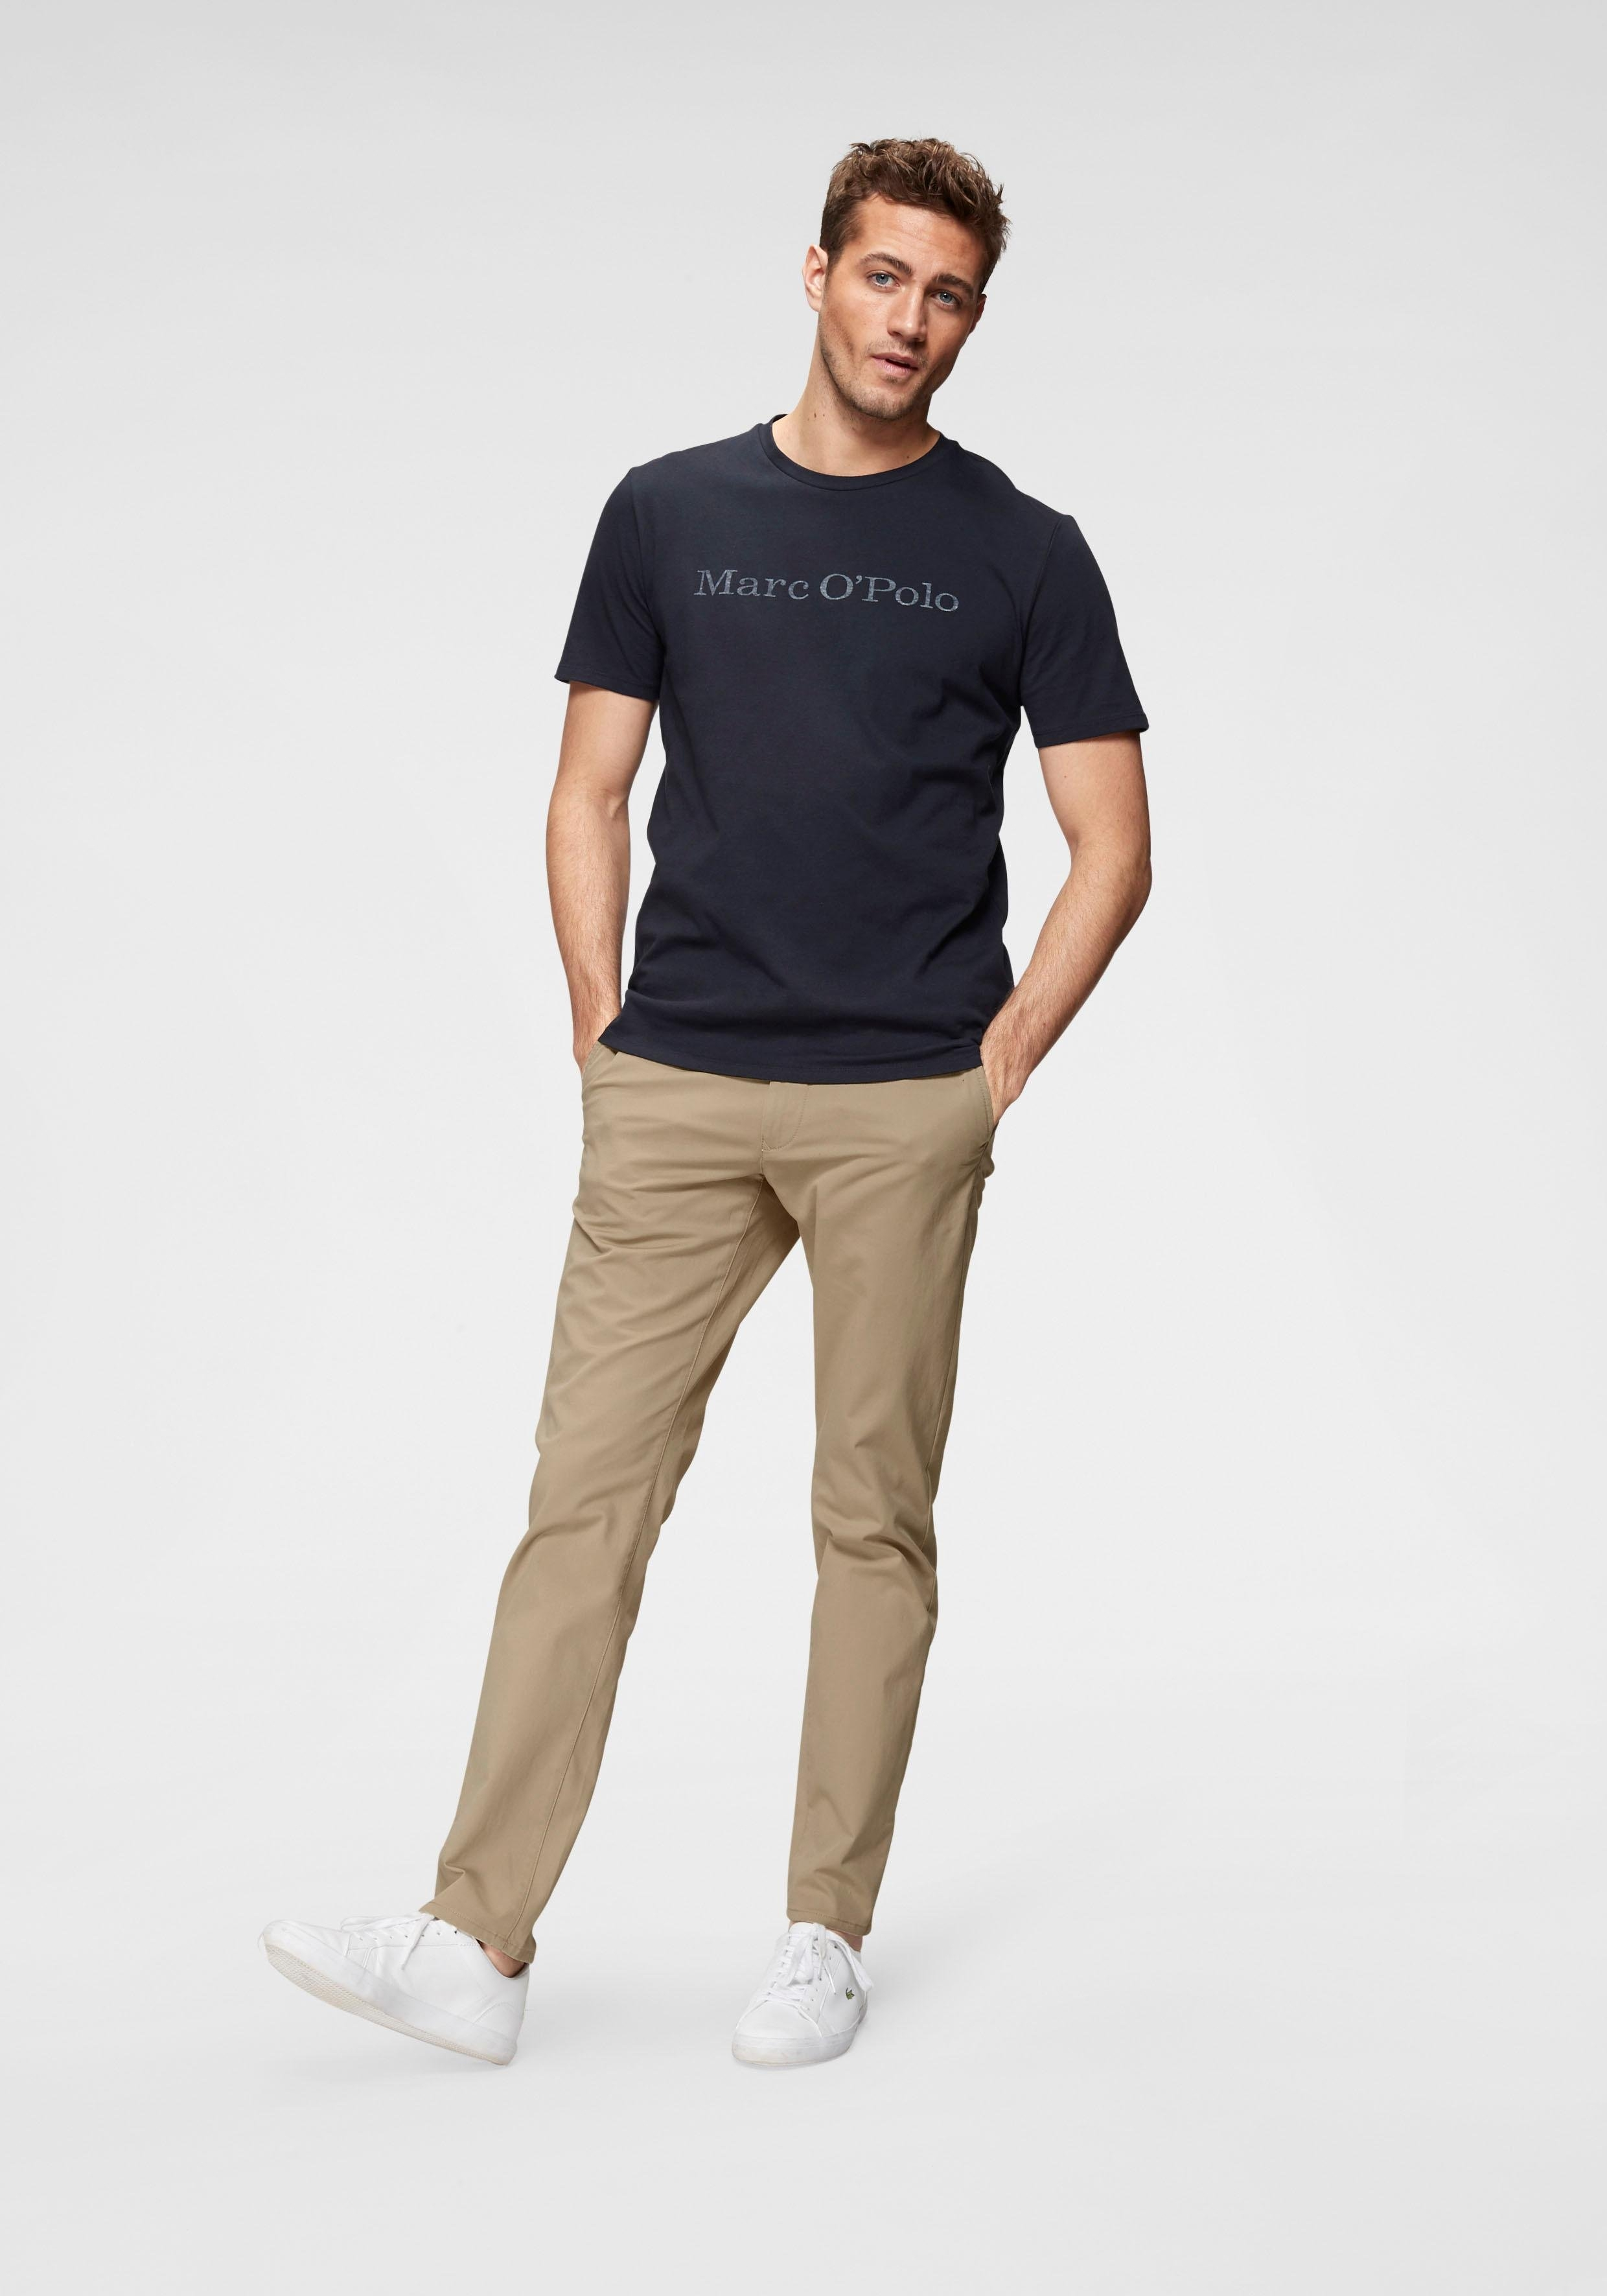 T O'polo Online Marc Gekocht Snel shirt CodeBx